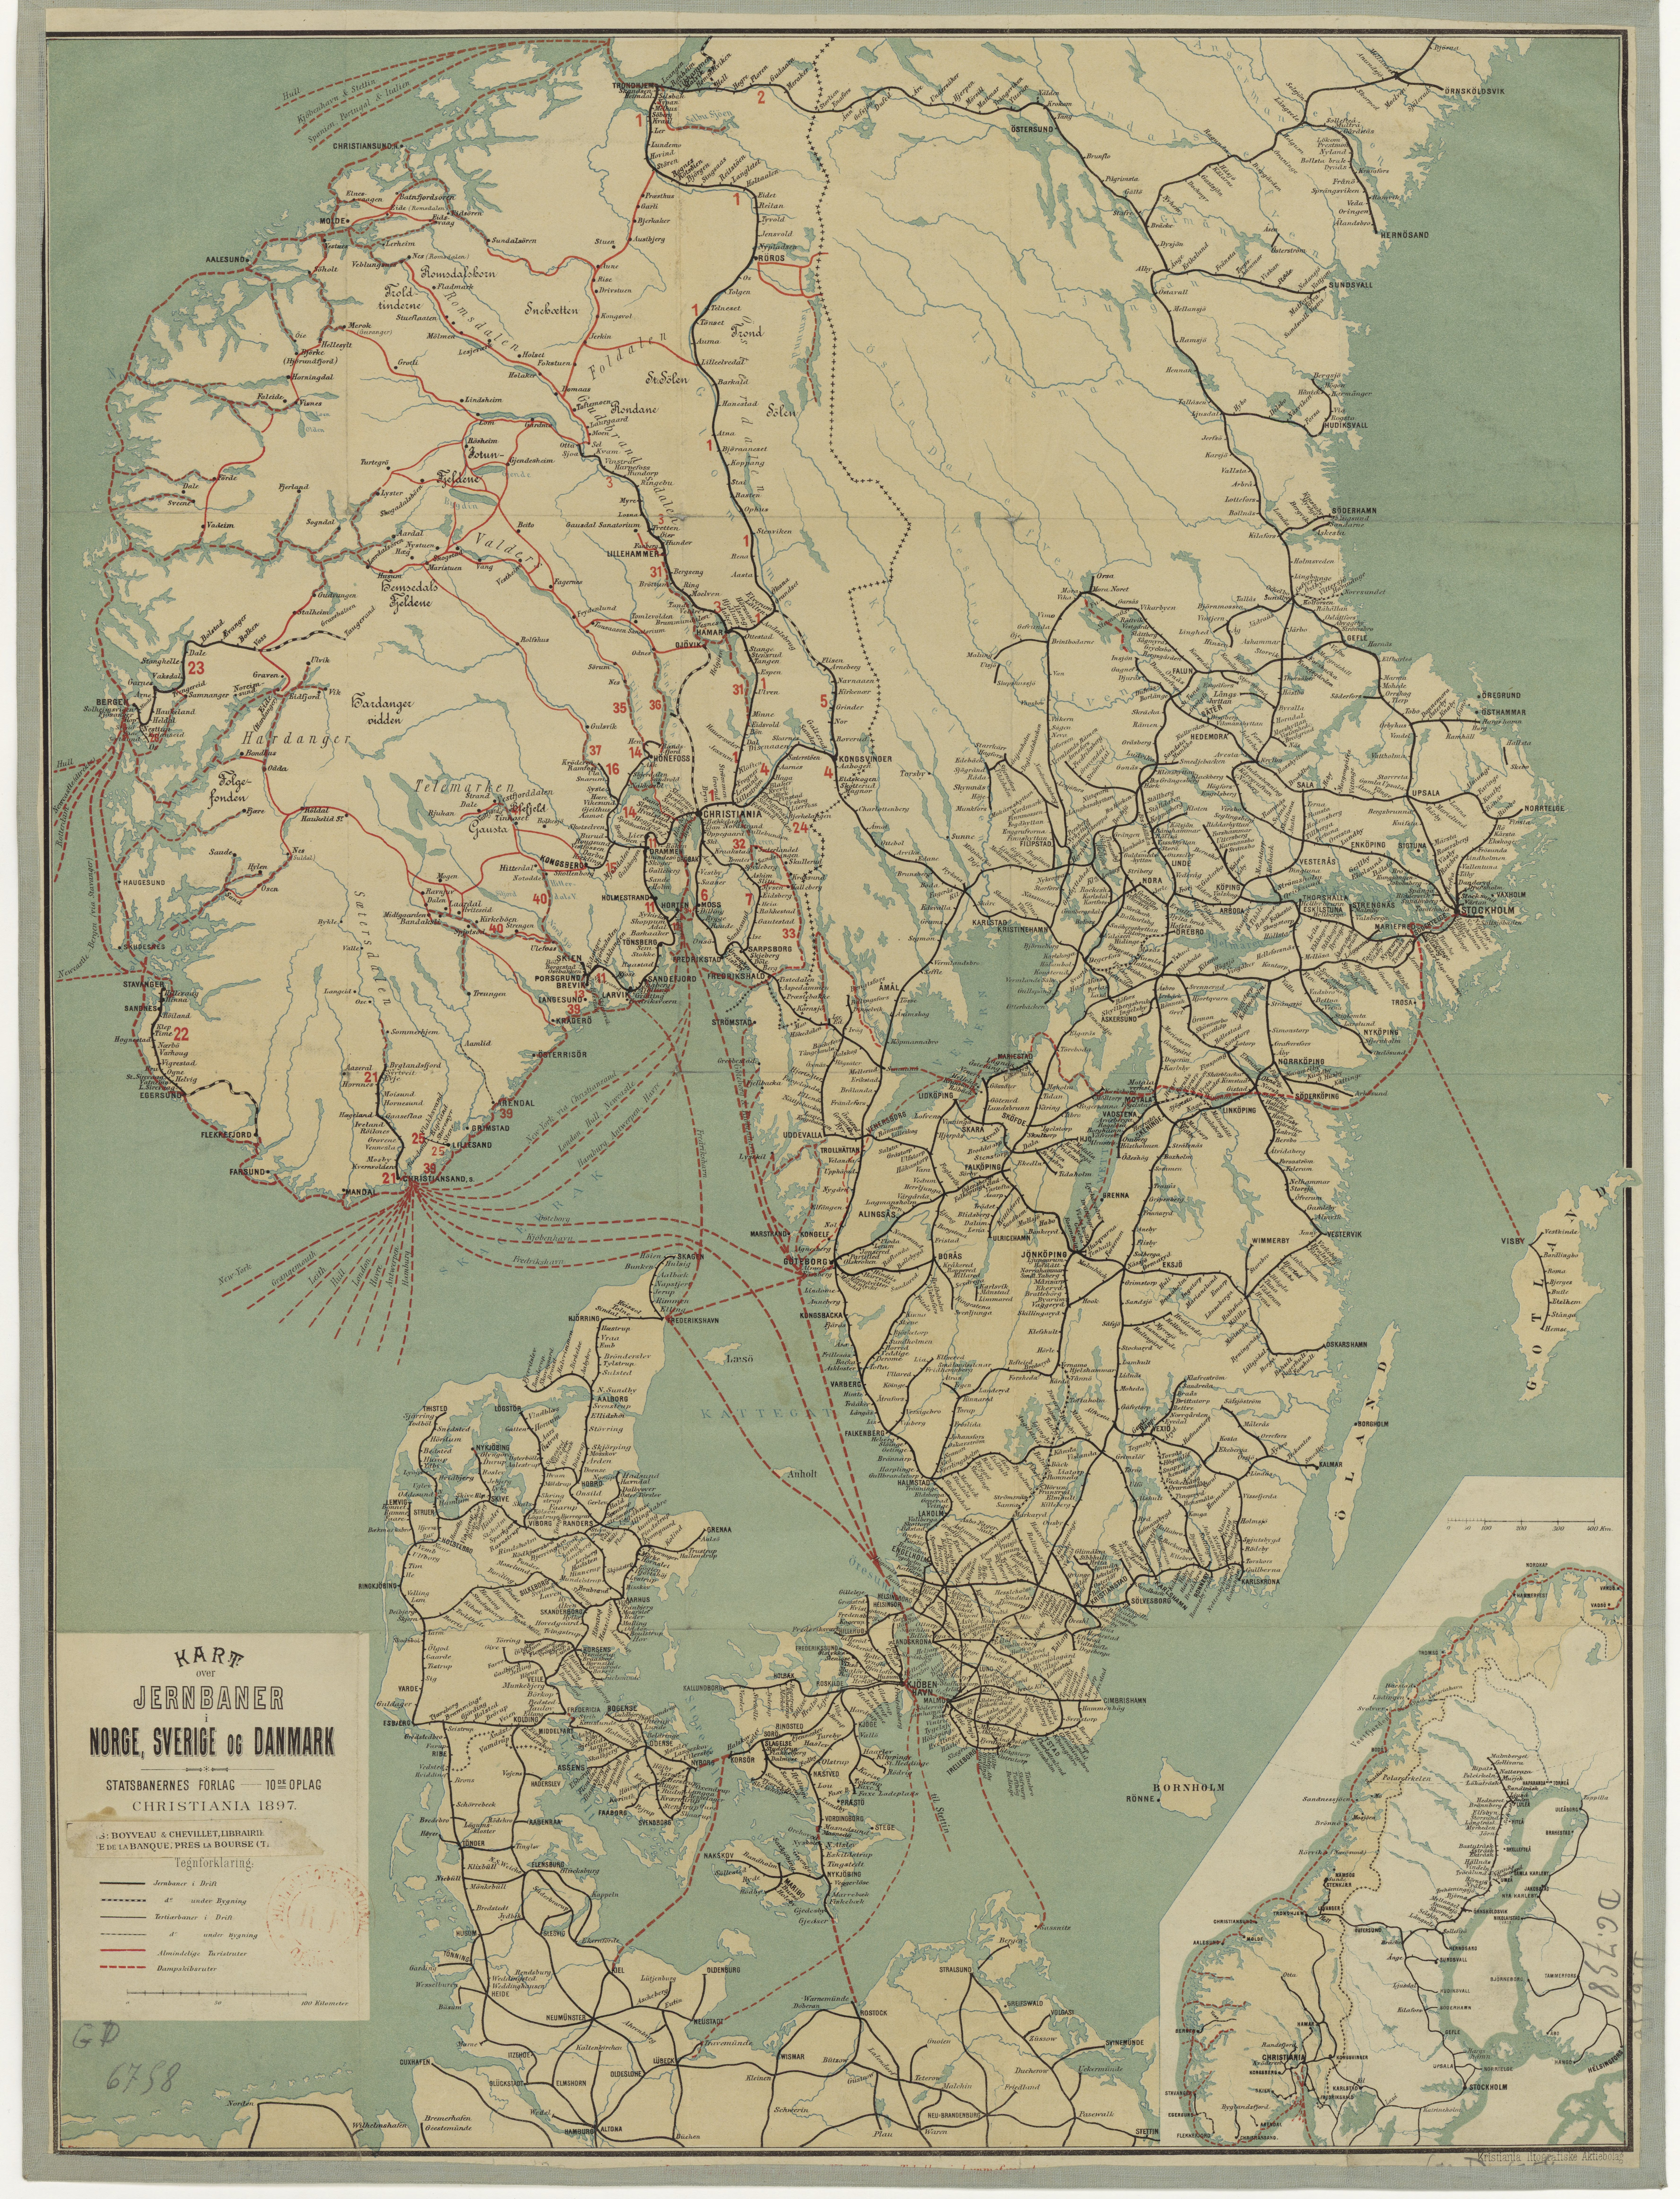 kart norge sverige danmark Fil:Kart over jernbaner i Norge, Sverige og Danmark (1897).  kart norge sverige danmark